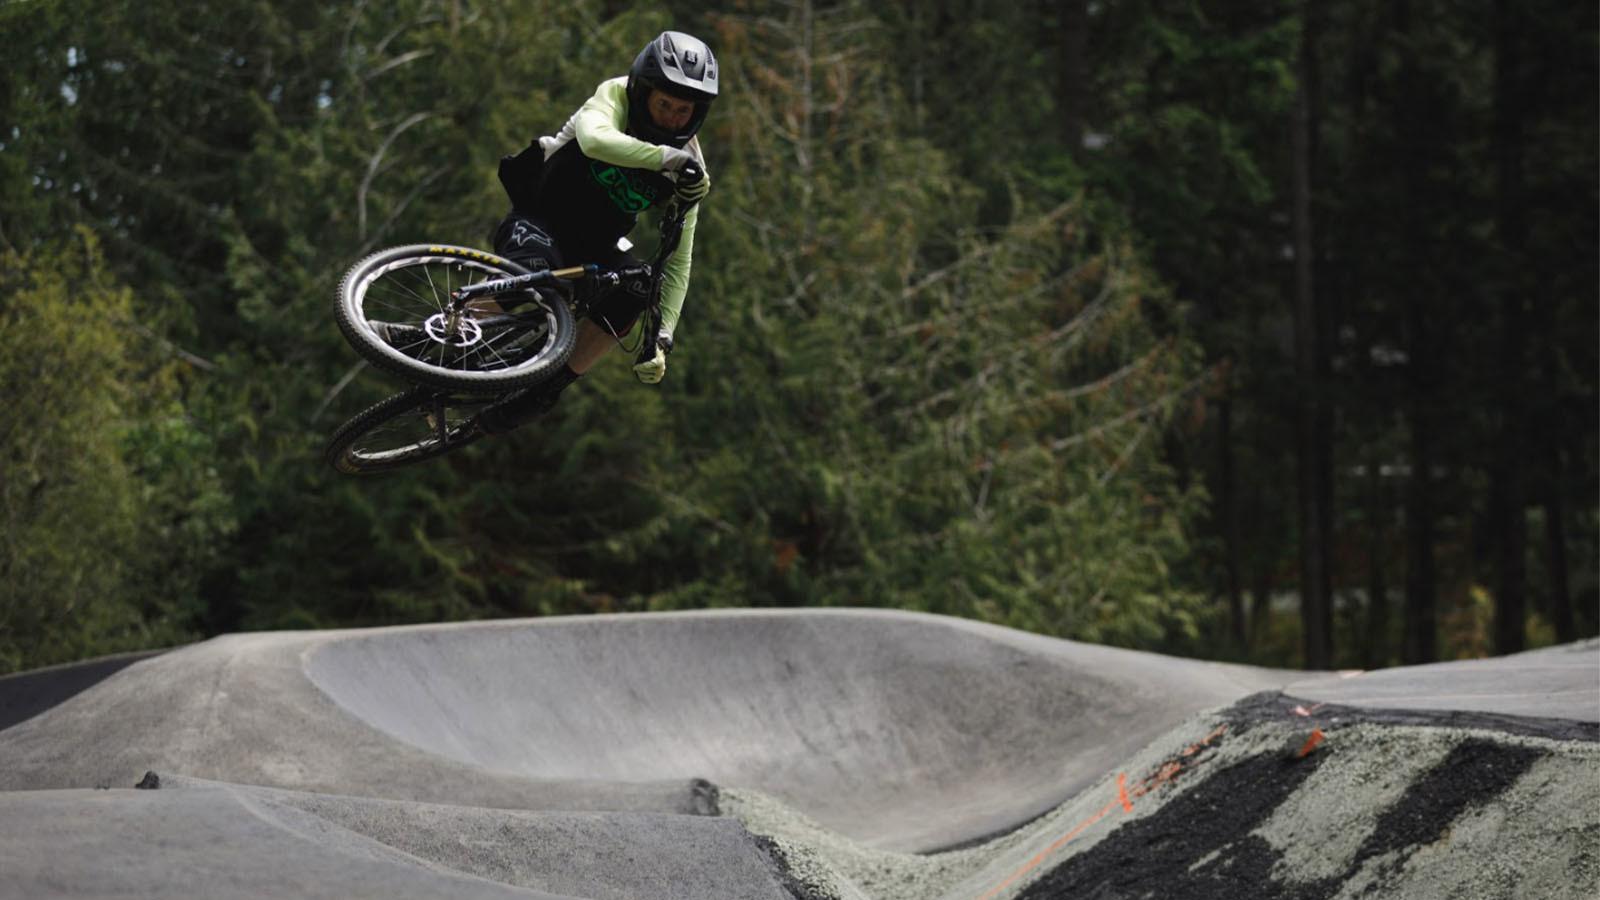 Jordie Lunn Bike Park's Massive Pumptrack